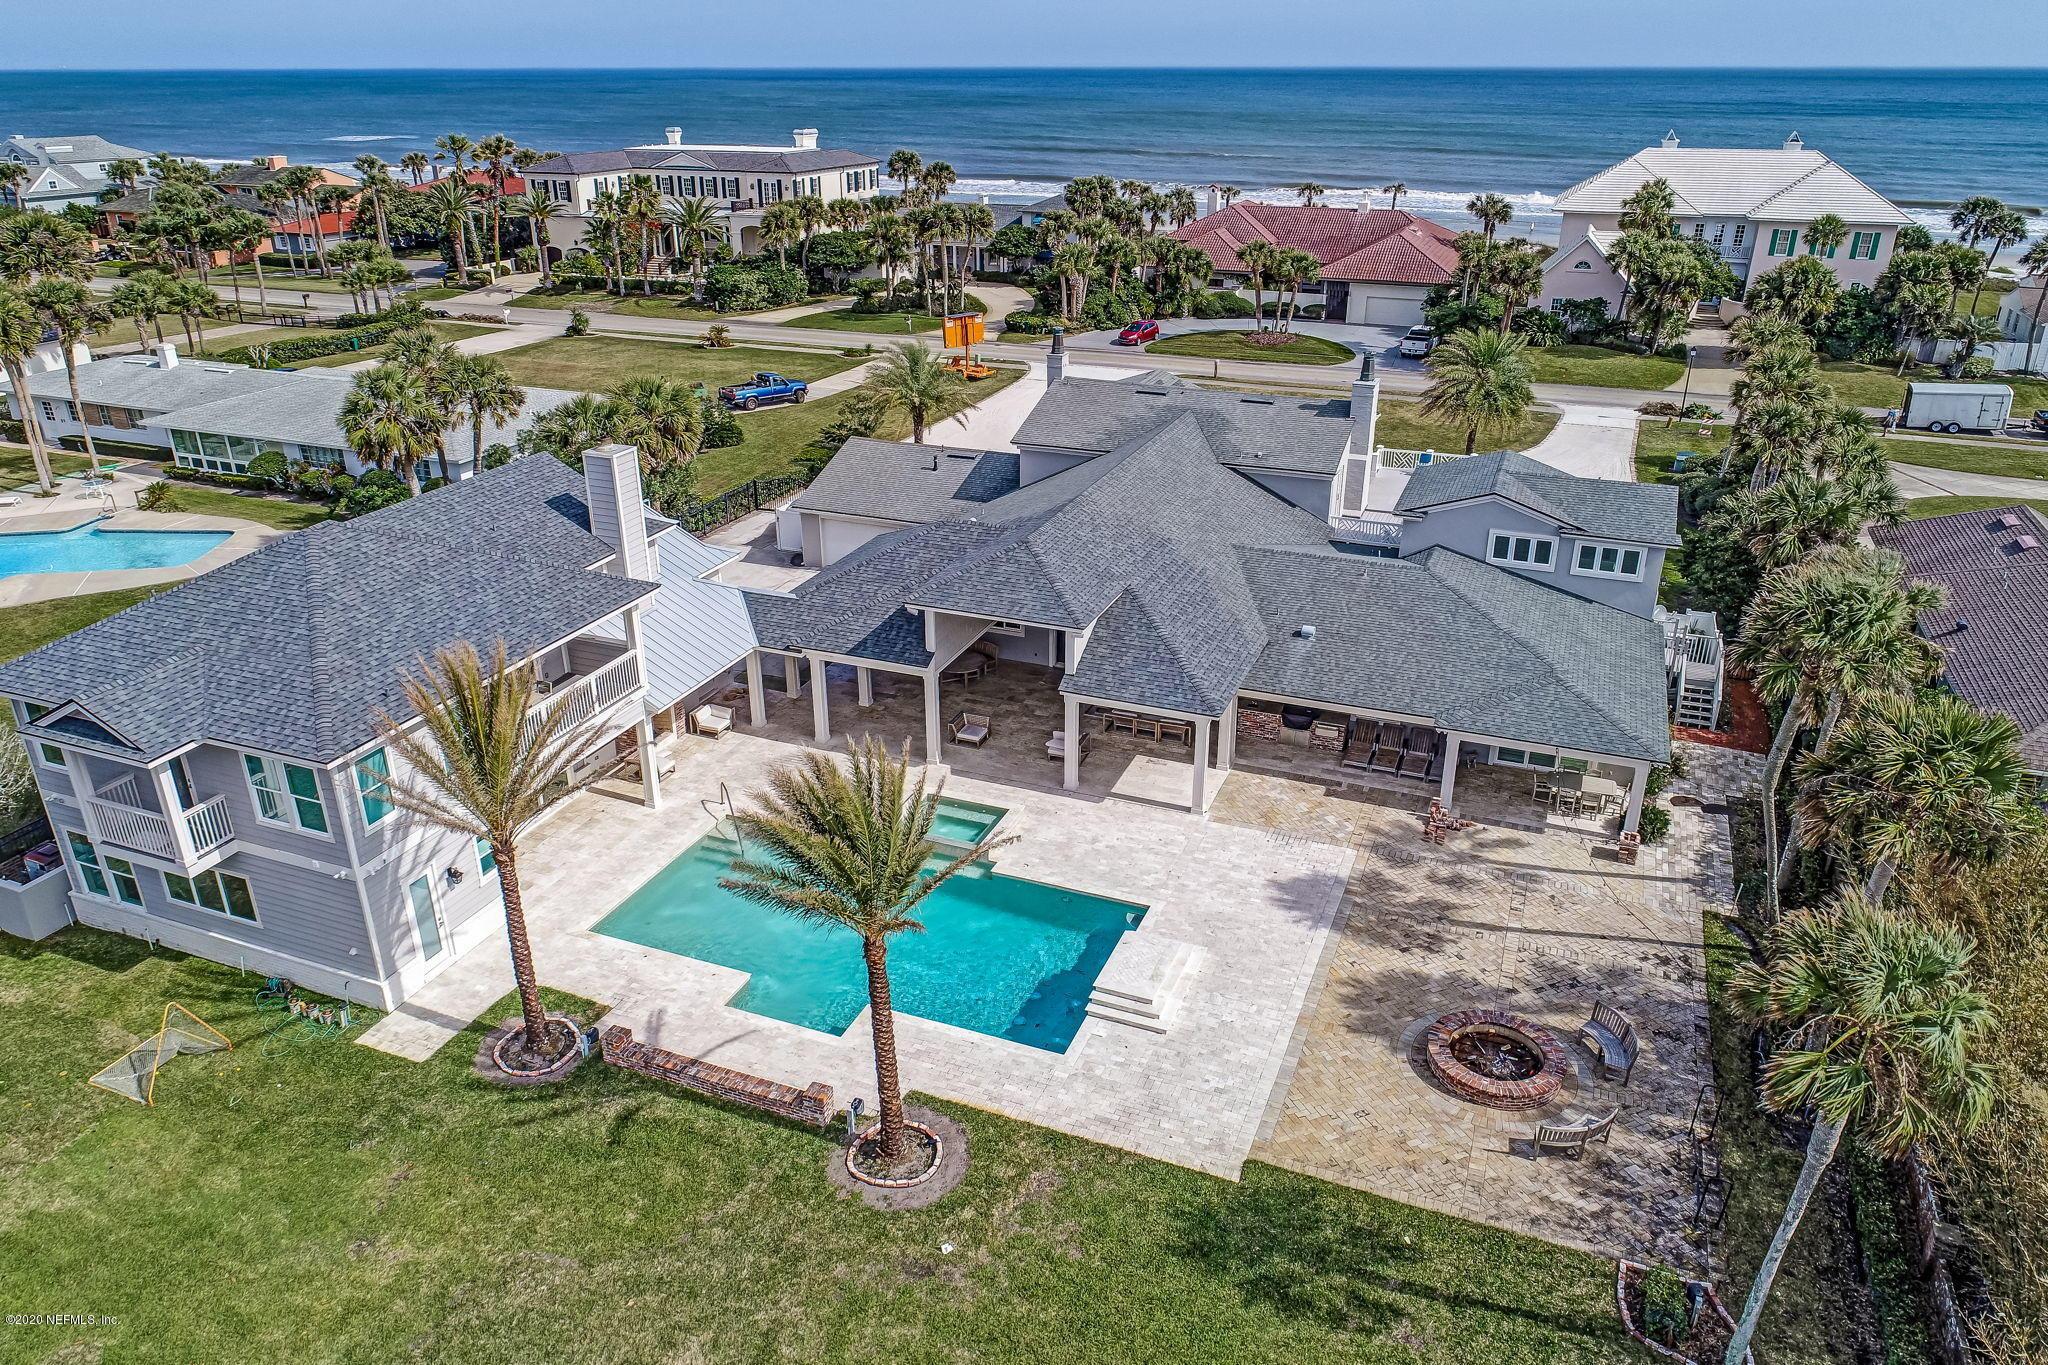 340 PONTE VEDRA, PONTE VEDRA BEACH, FLORIDA 32082, 7 Bedrooms Bedrooms, ,7 BathroomsBathrooms,Residential,For sale,PONTE VEDRA,1038625